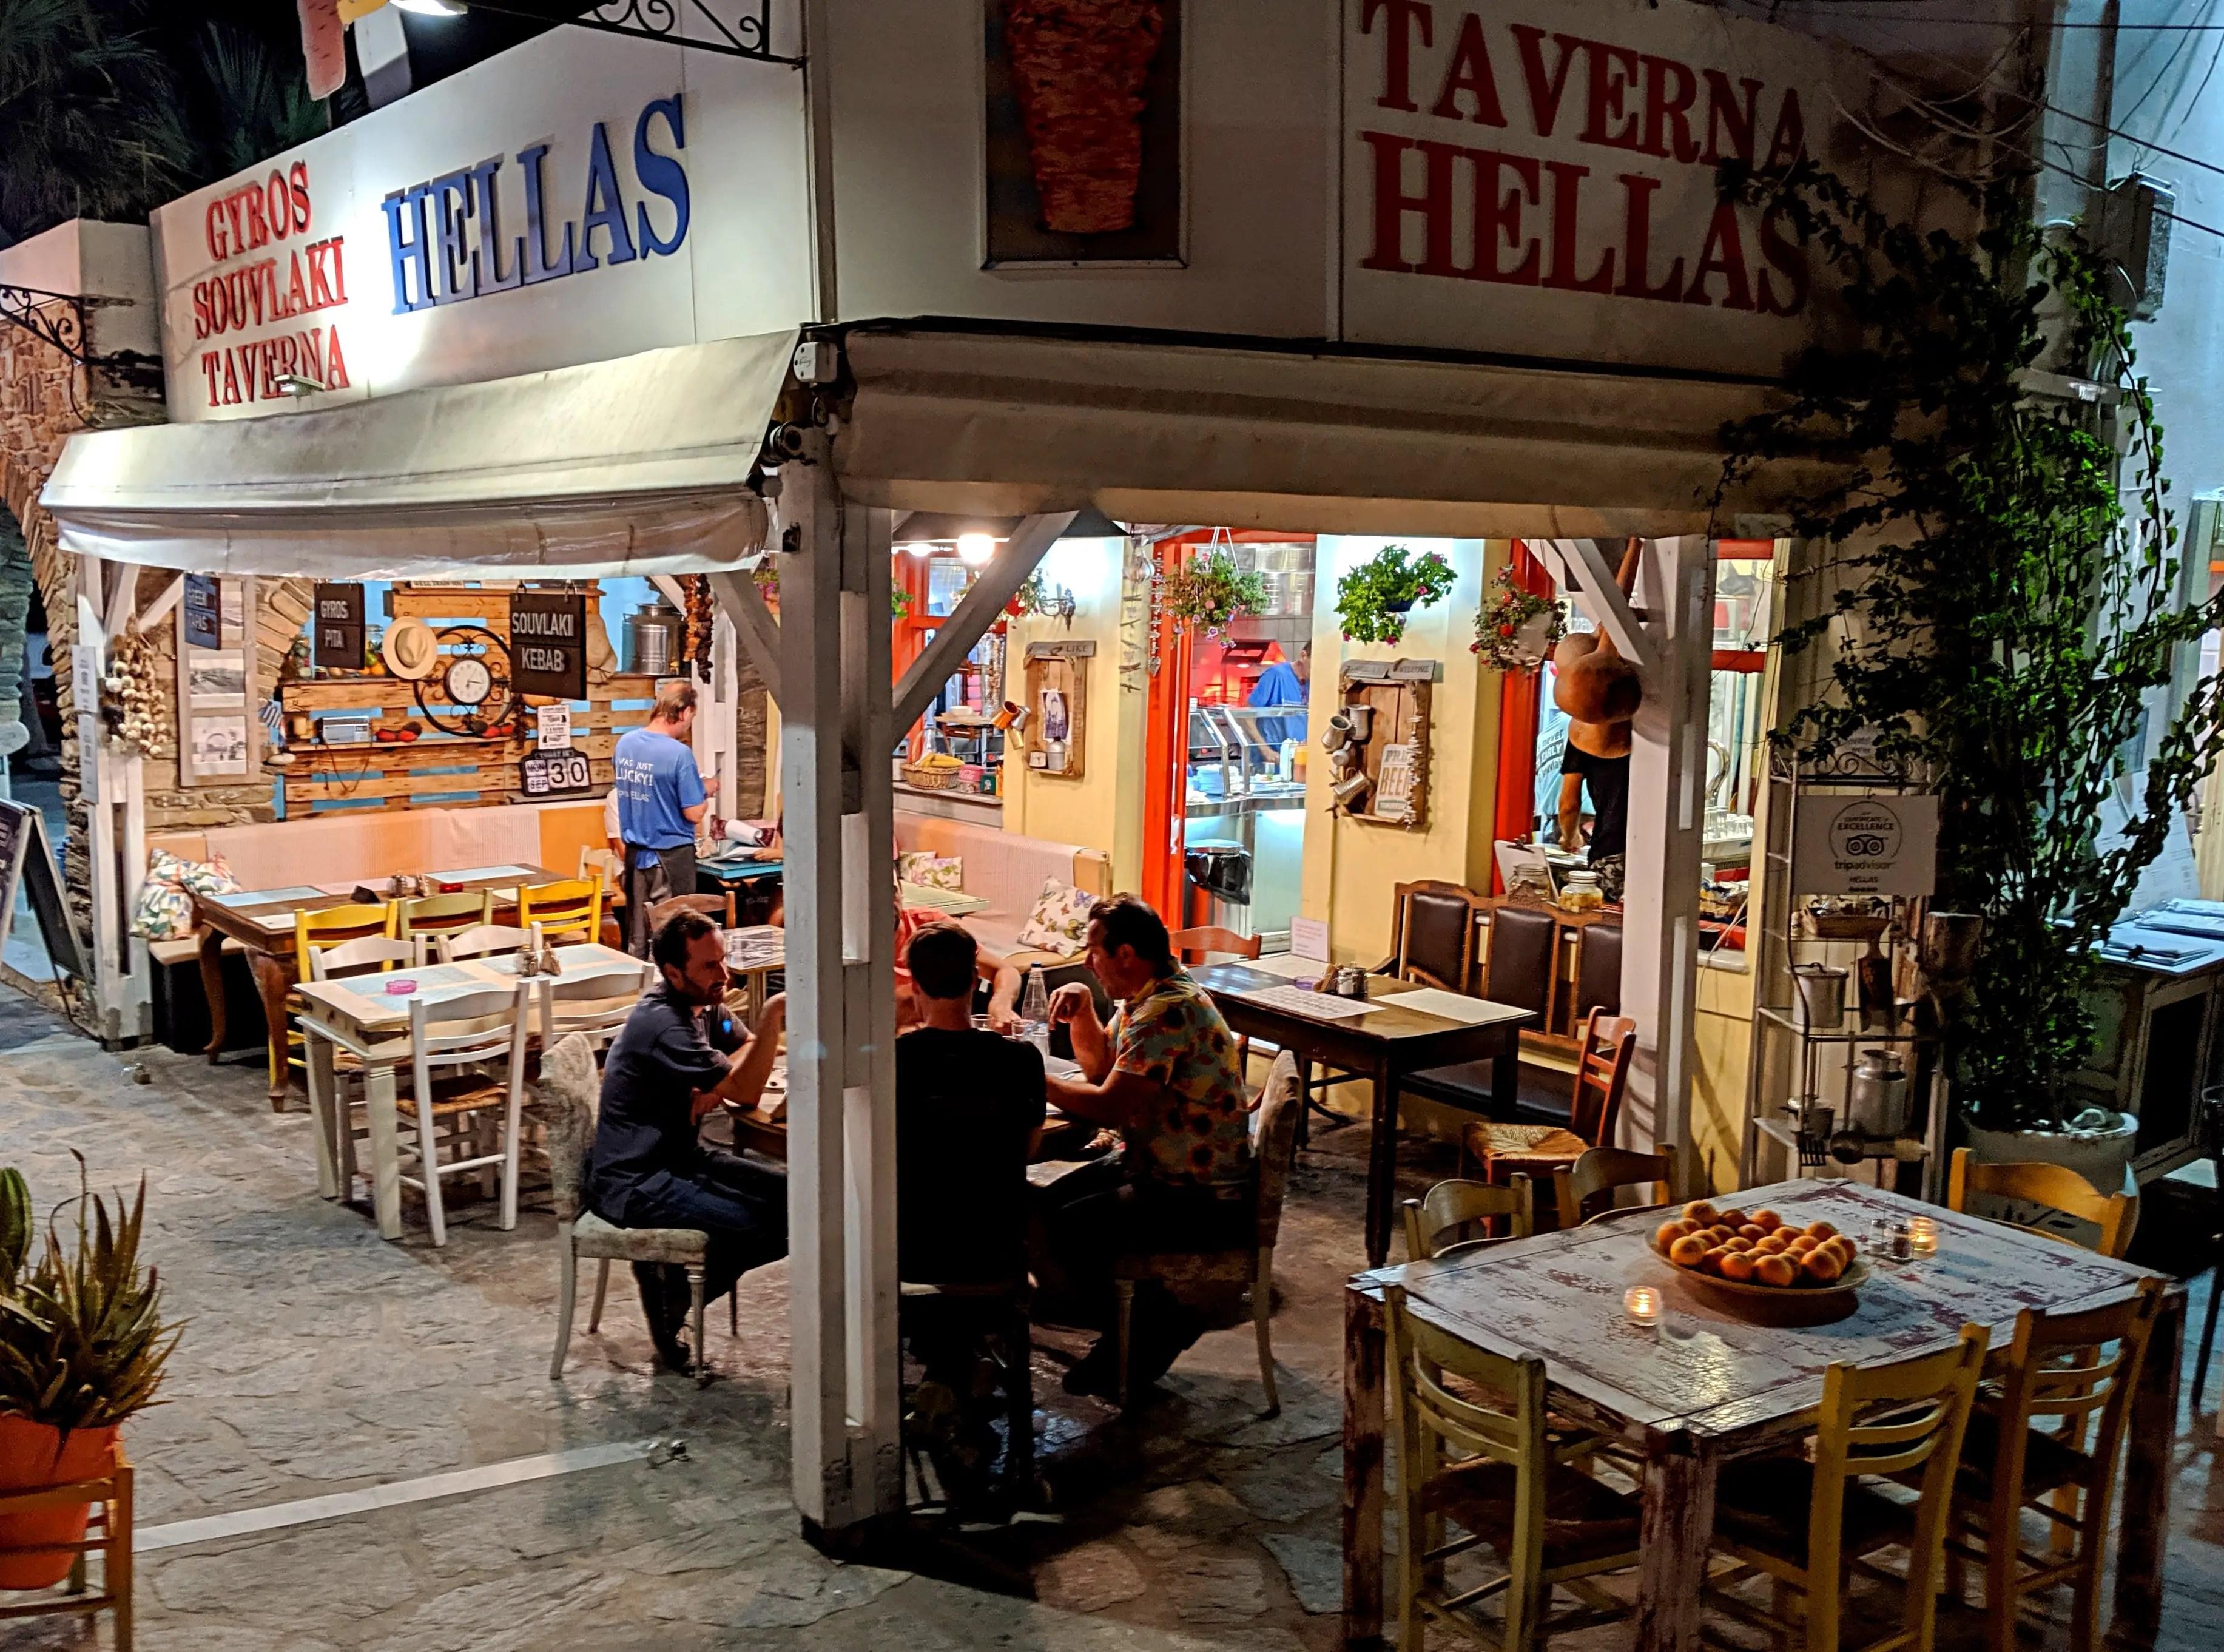 Hellas restaurant outside seating